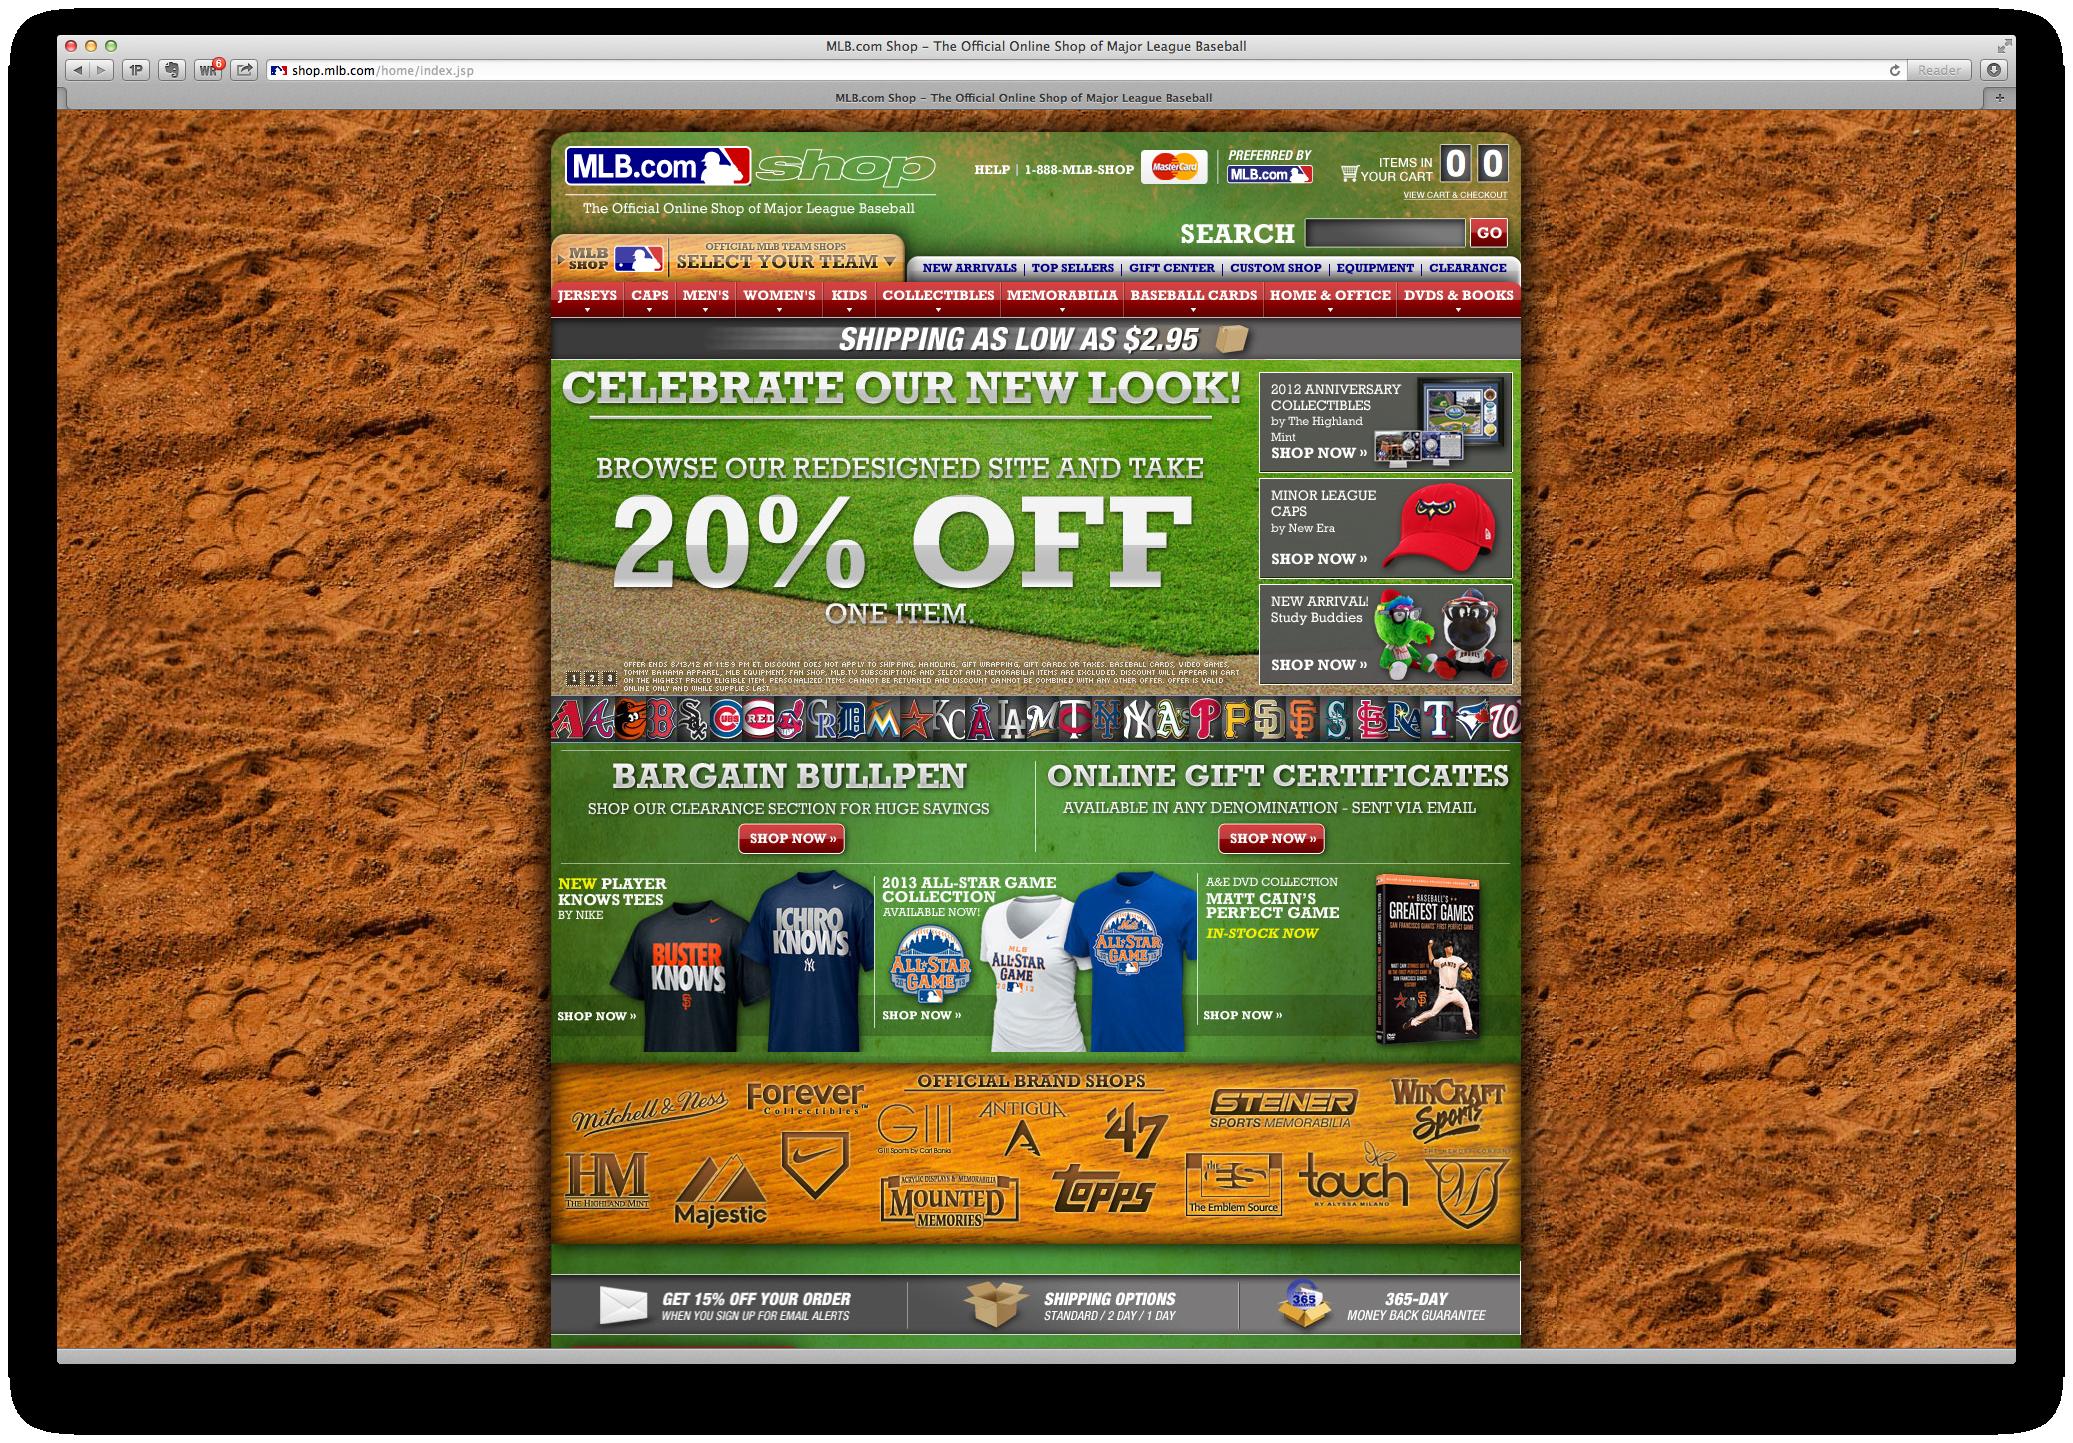 Review of the MLB Shop    Danny Bishop - Digital & Social